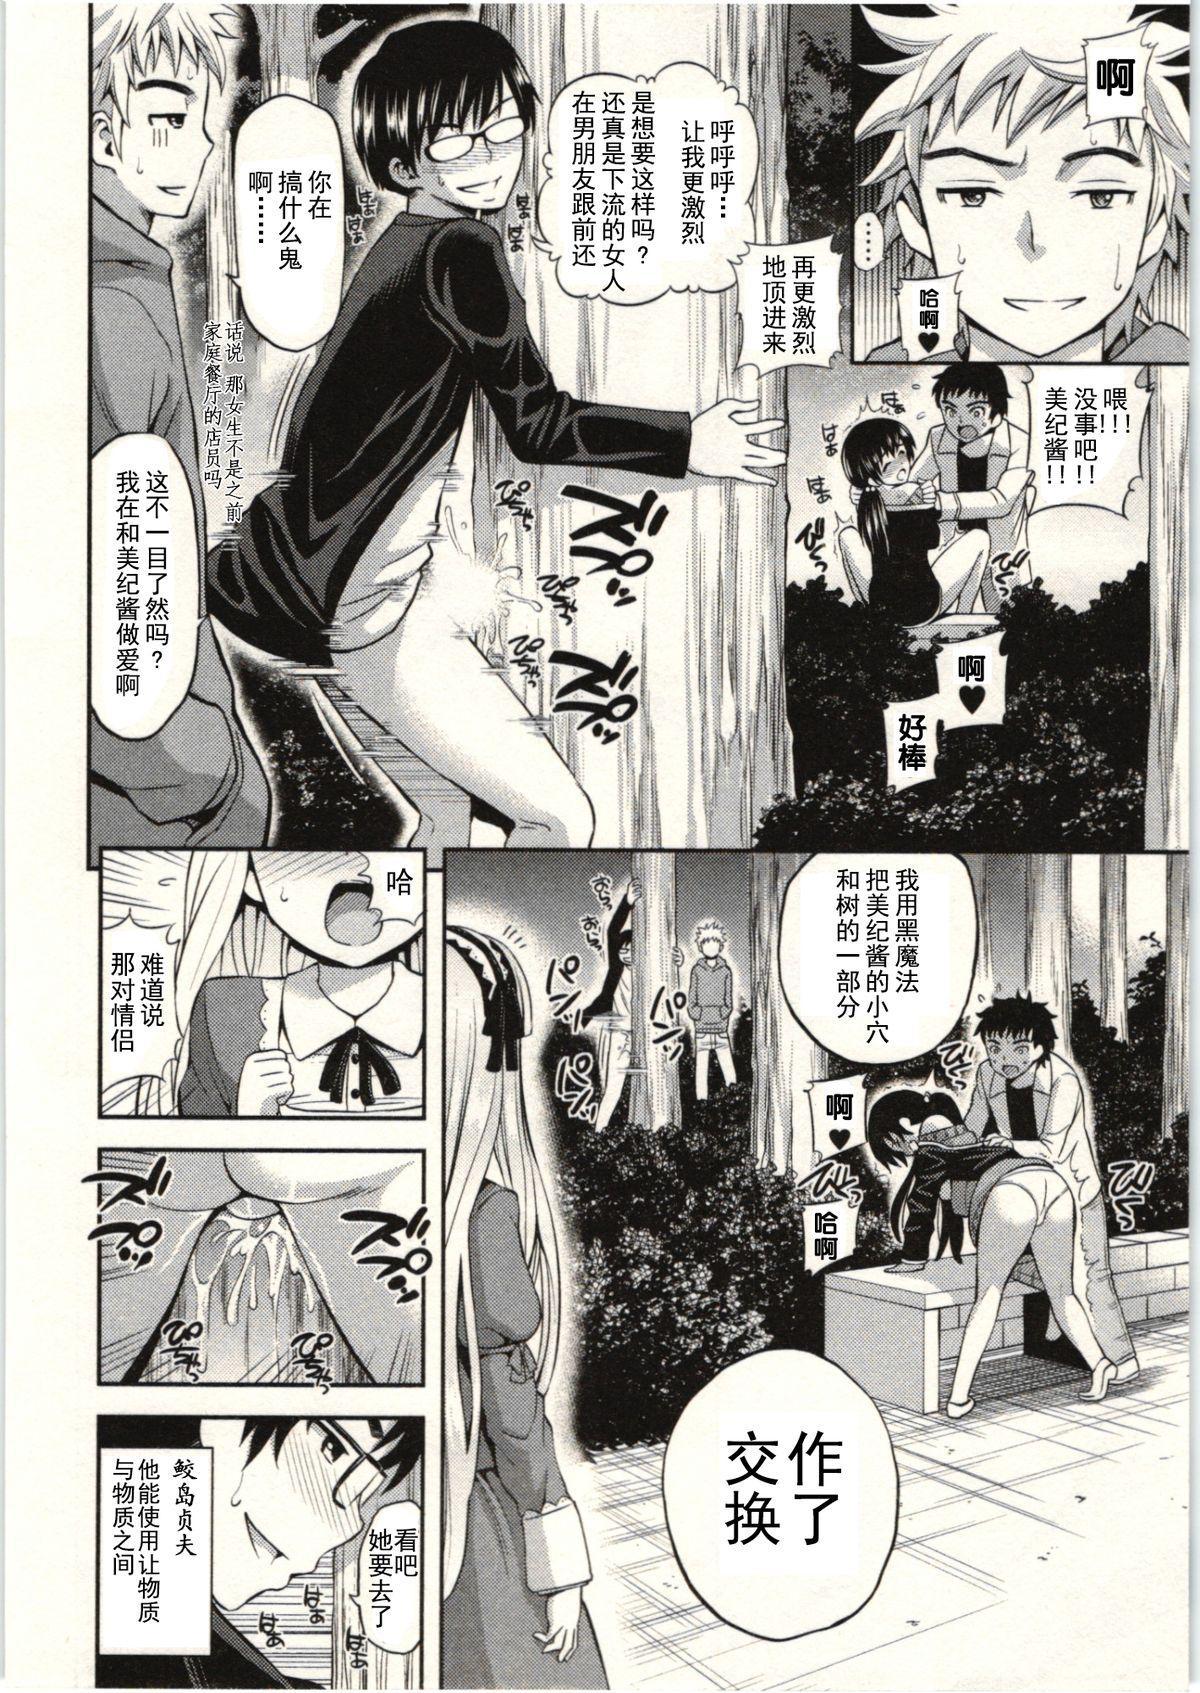 Tadashii Majutsu no Asobikata - The right way of playing of magic. 124